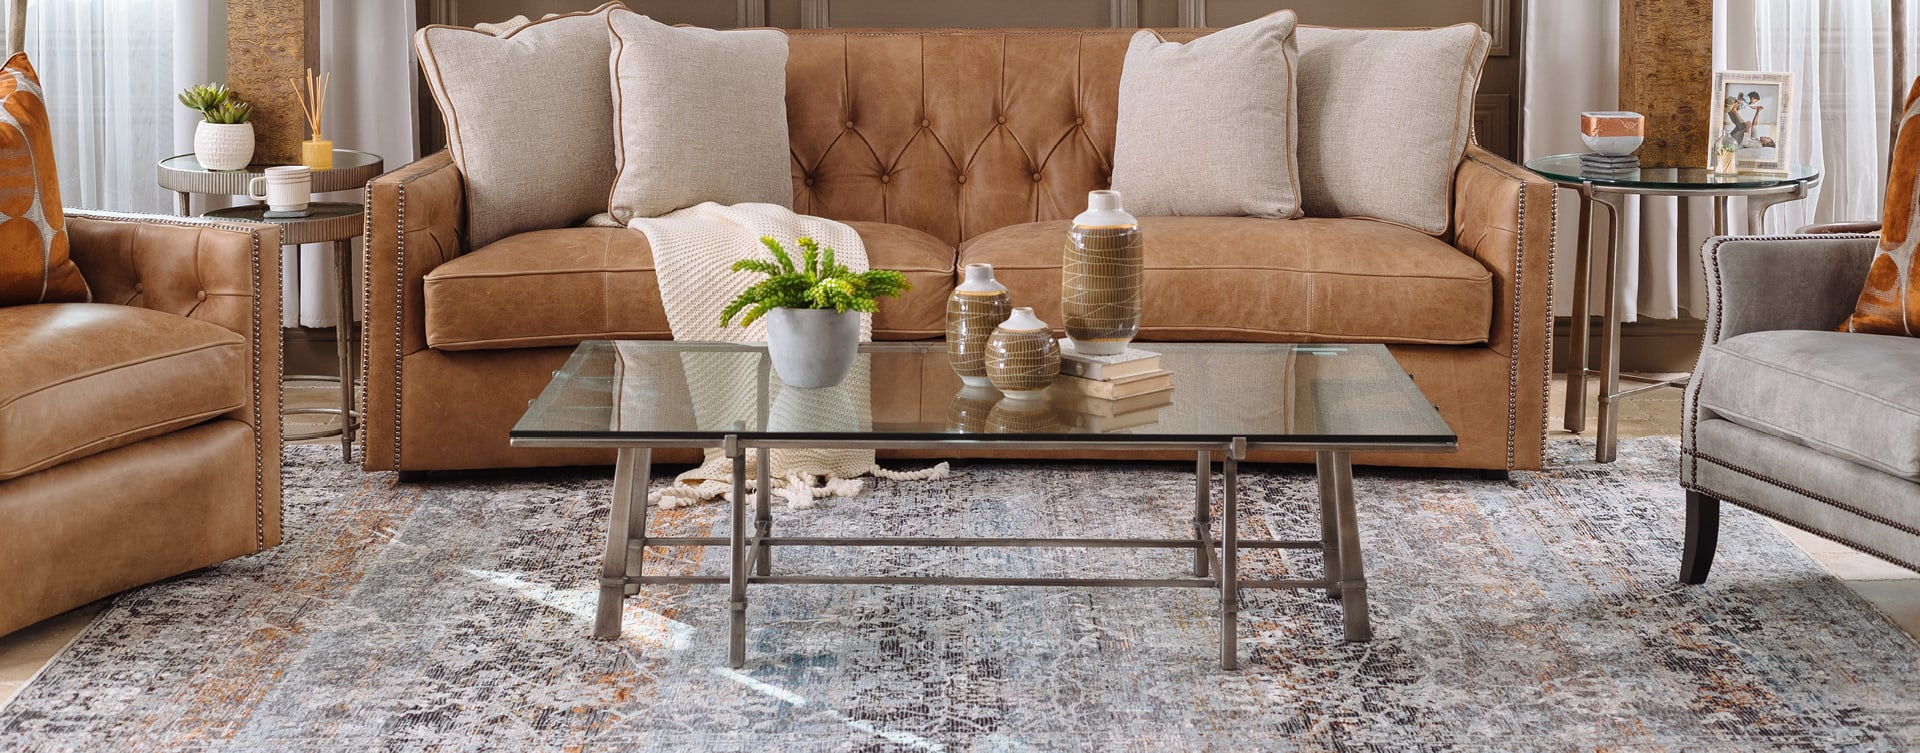 Caramel Comfort  Mathis Brothers Furniture